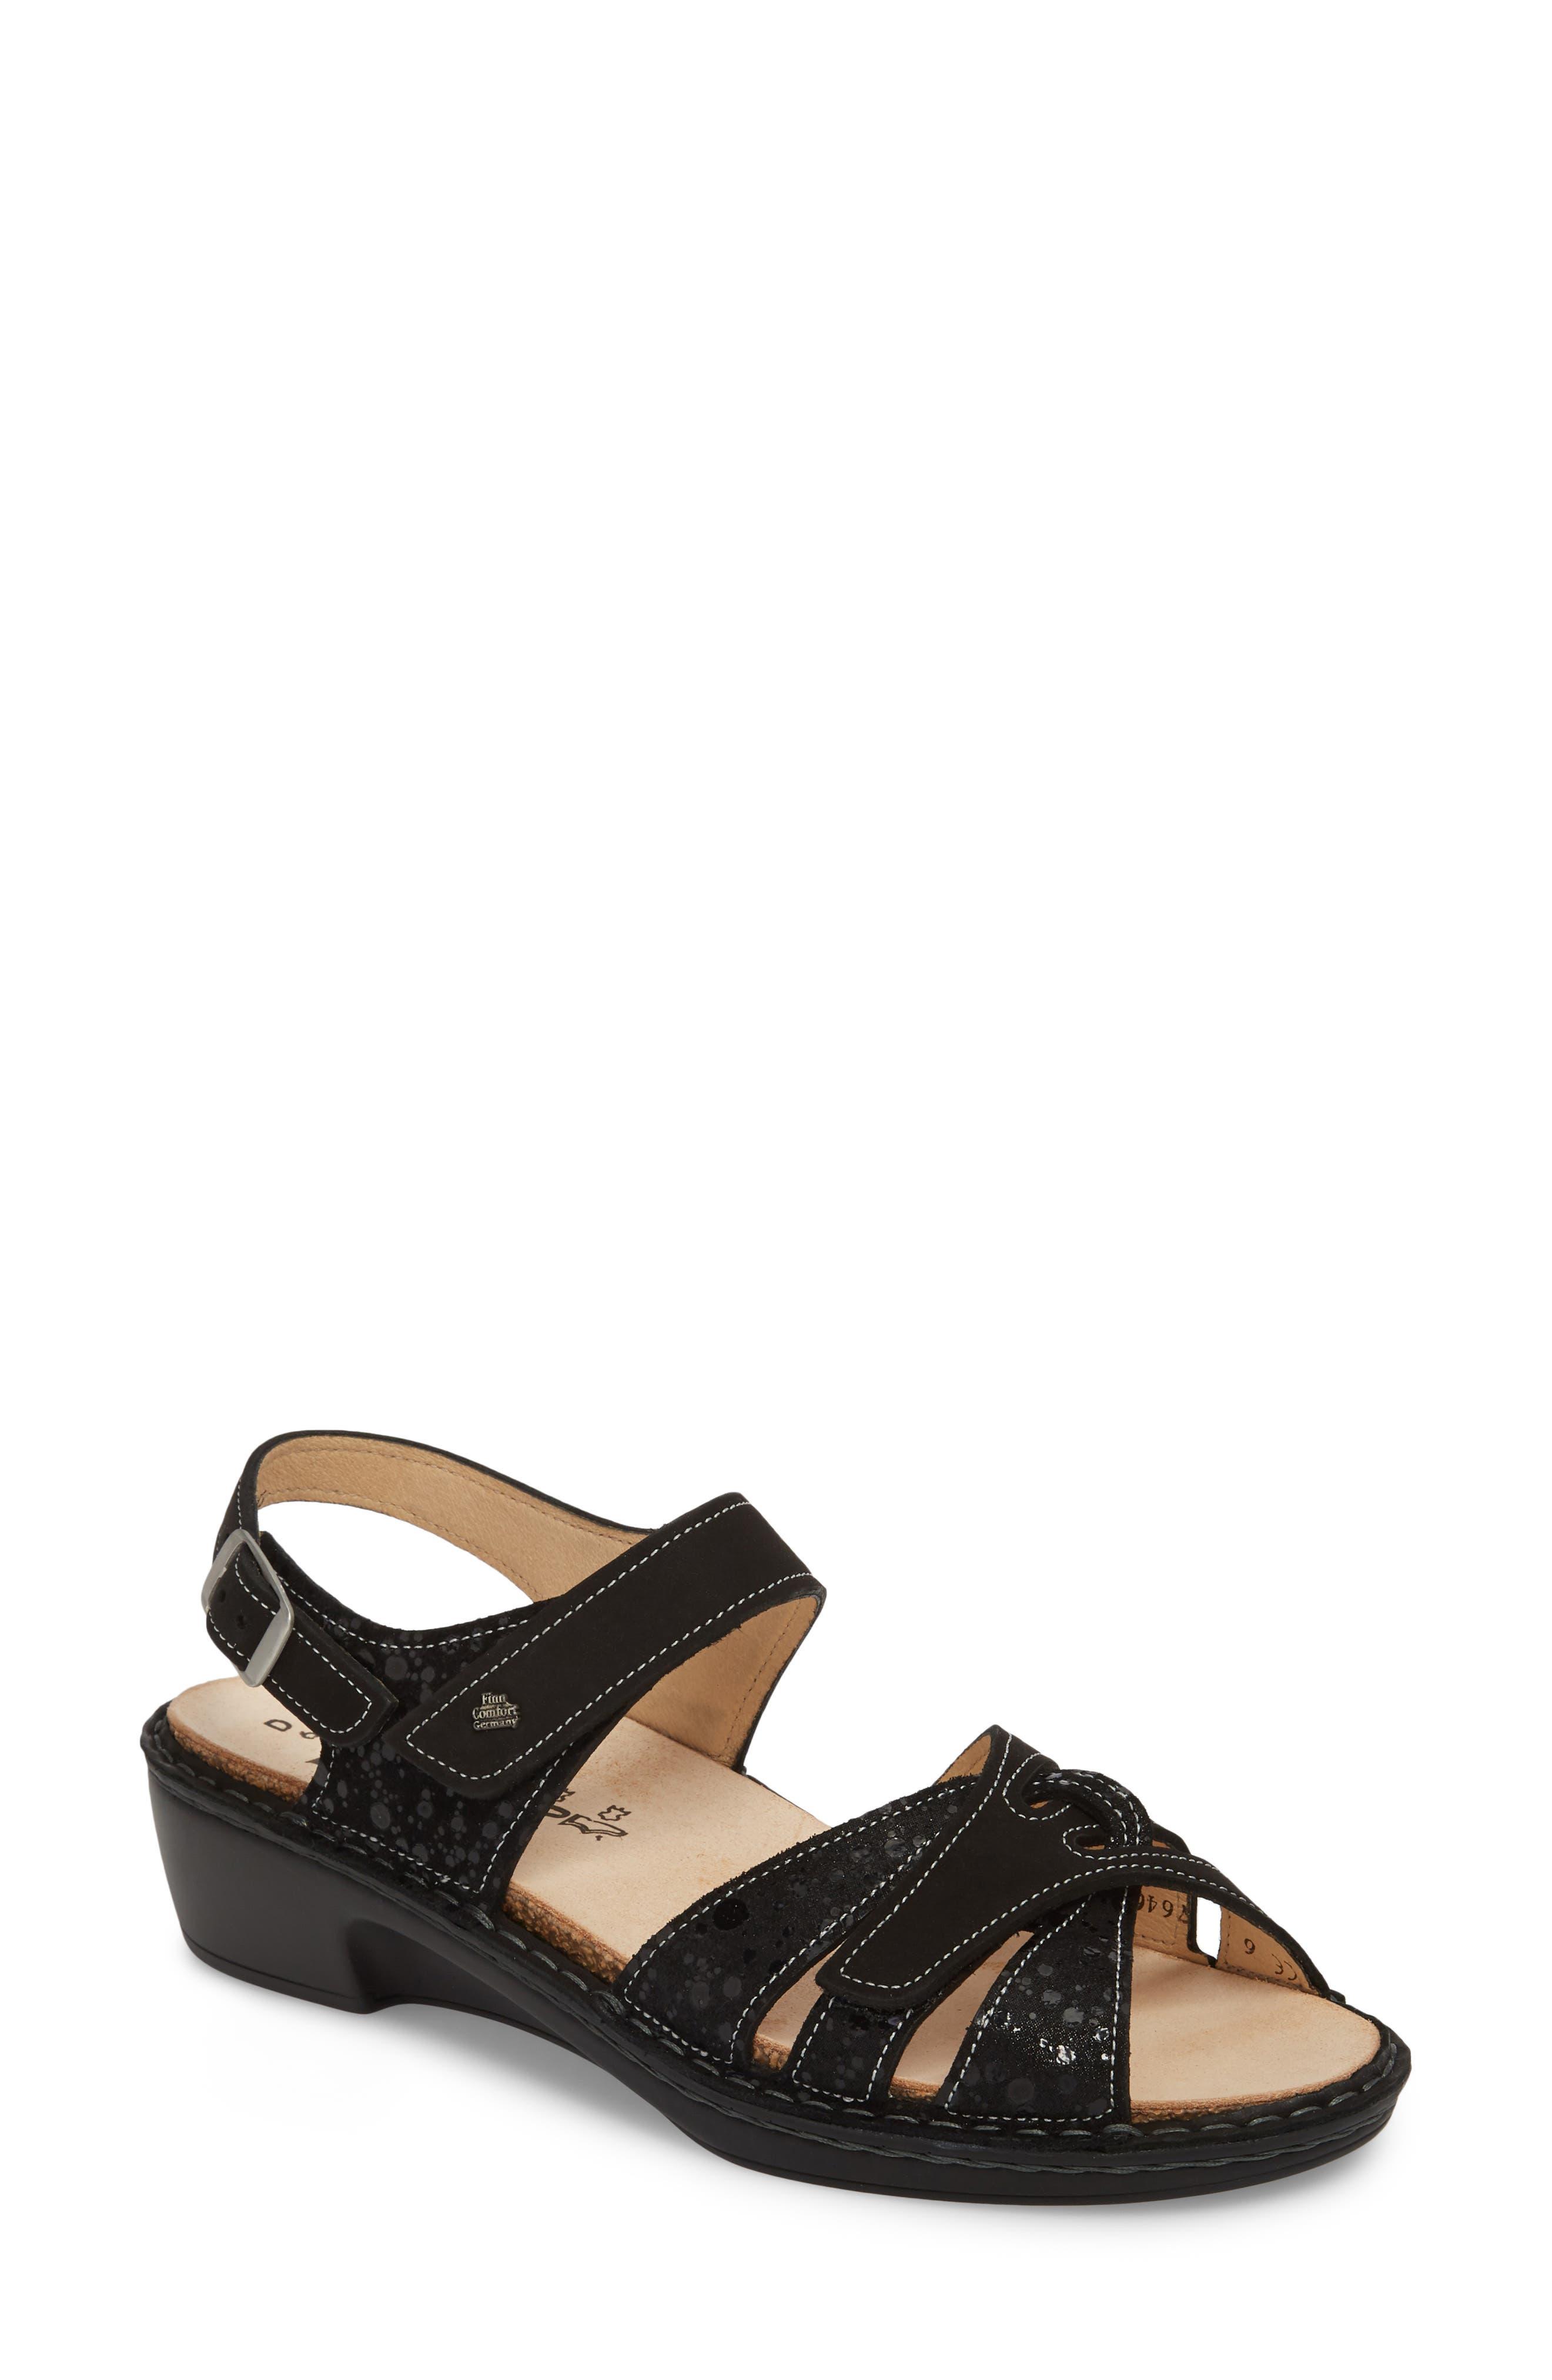 Buka Sandal,                         Main,                         color, BLACK LEATHER